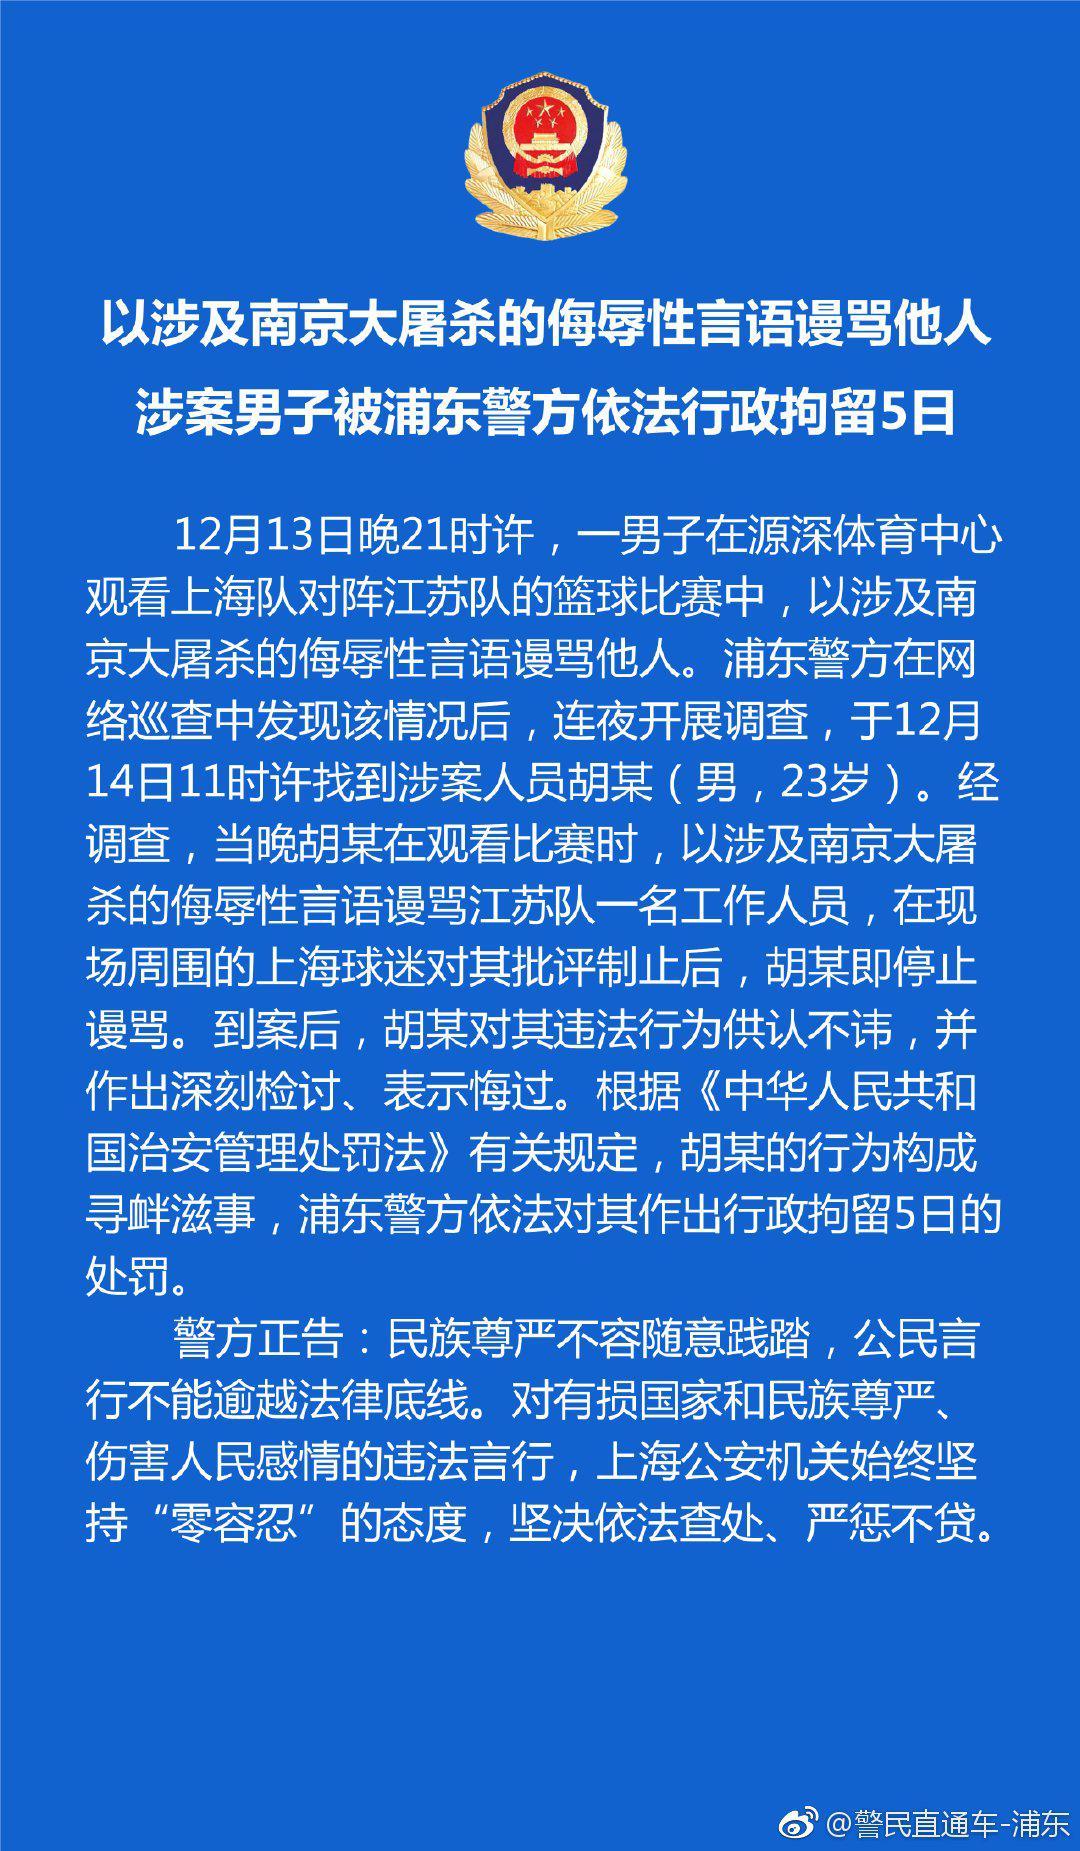 http://www.zgmaimai.cn/shehuiredian/166487.html